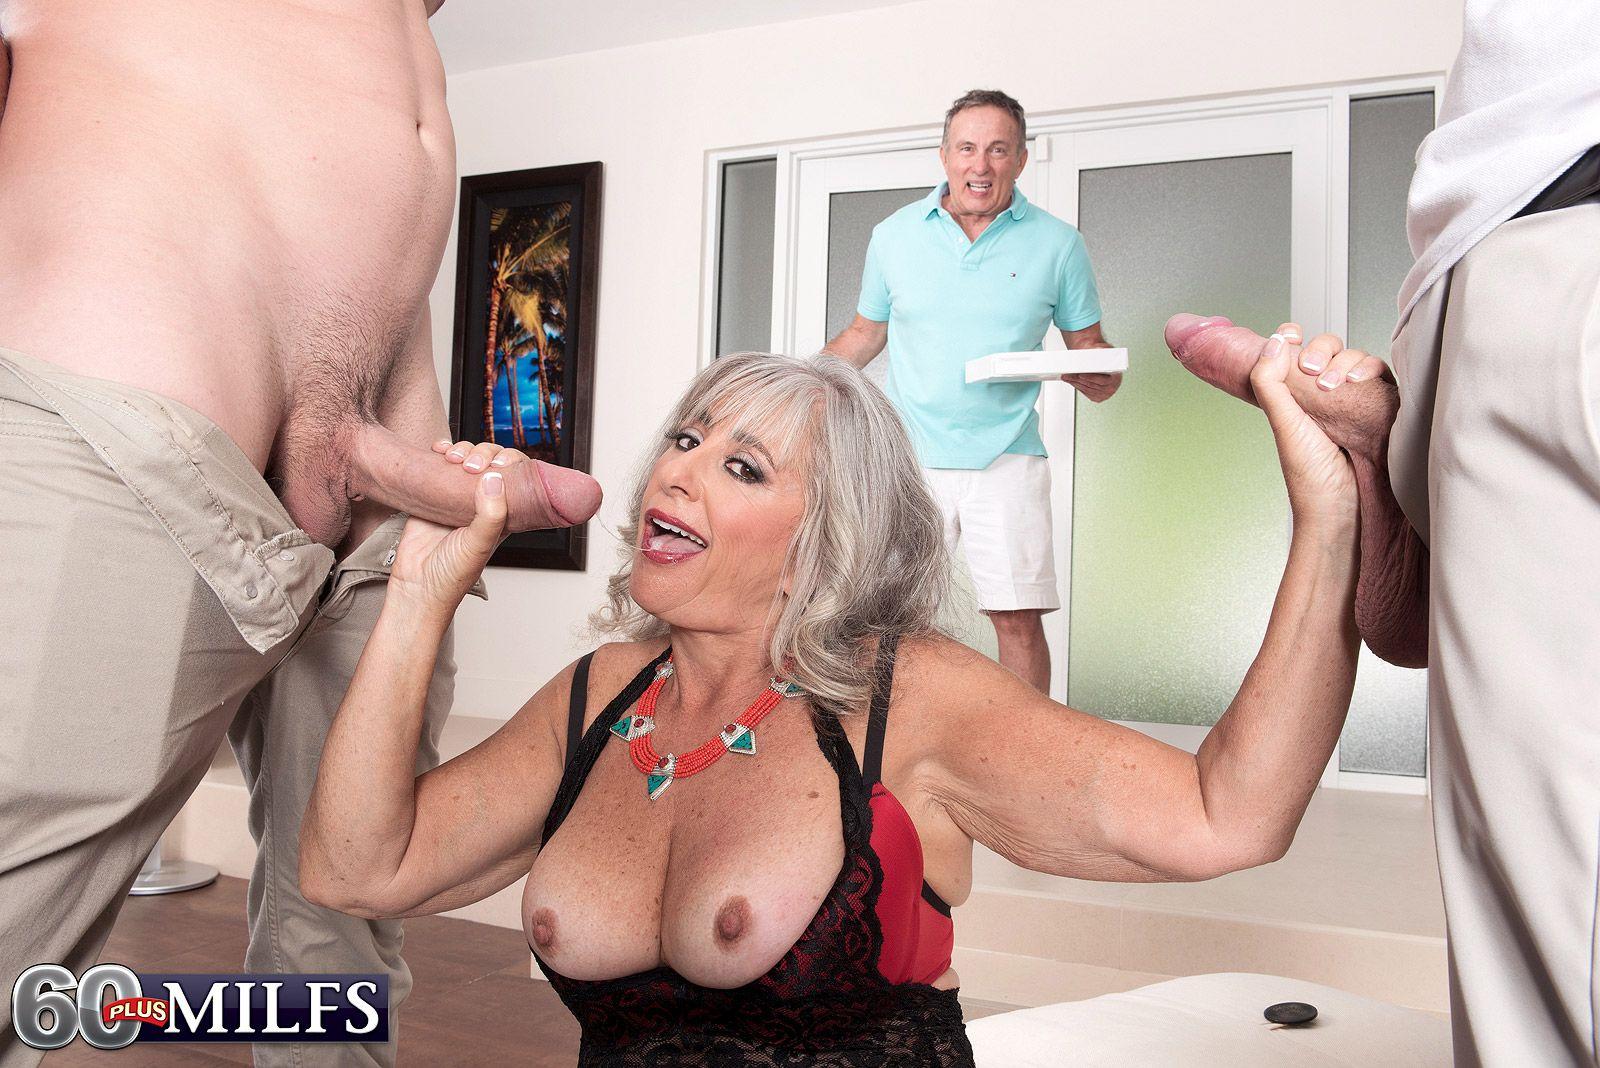 Mature MILF Silva Foxx blows 2 big white dicks to her cuckolded hubby's dismay